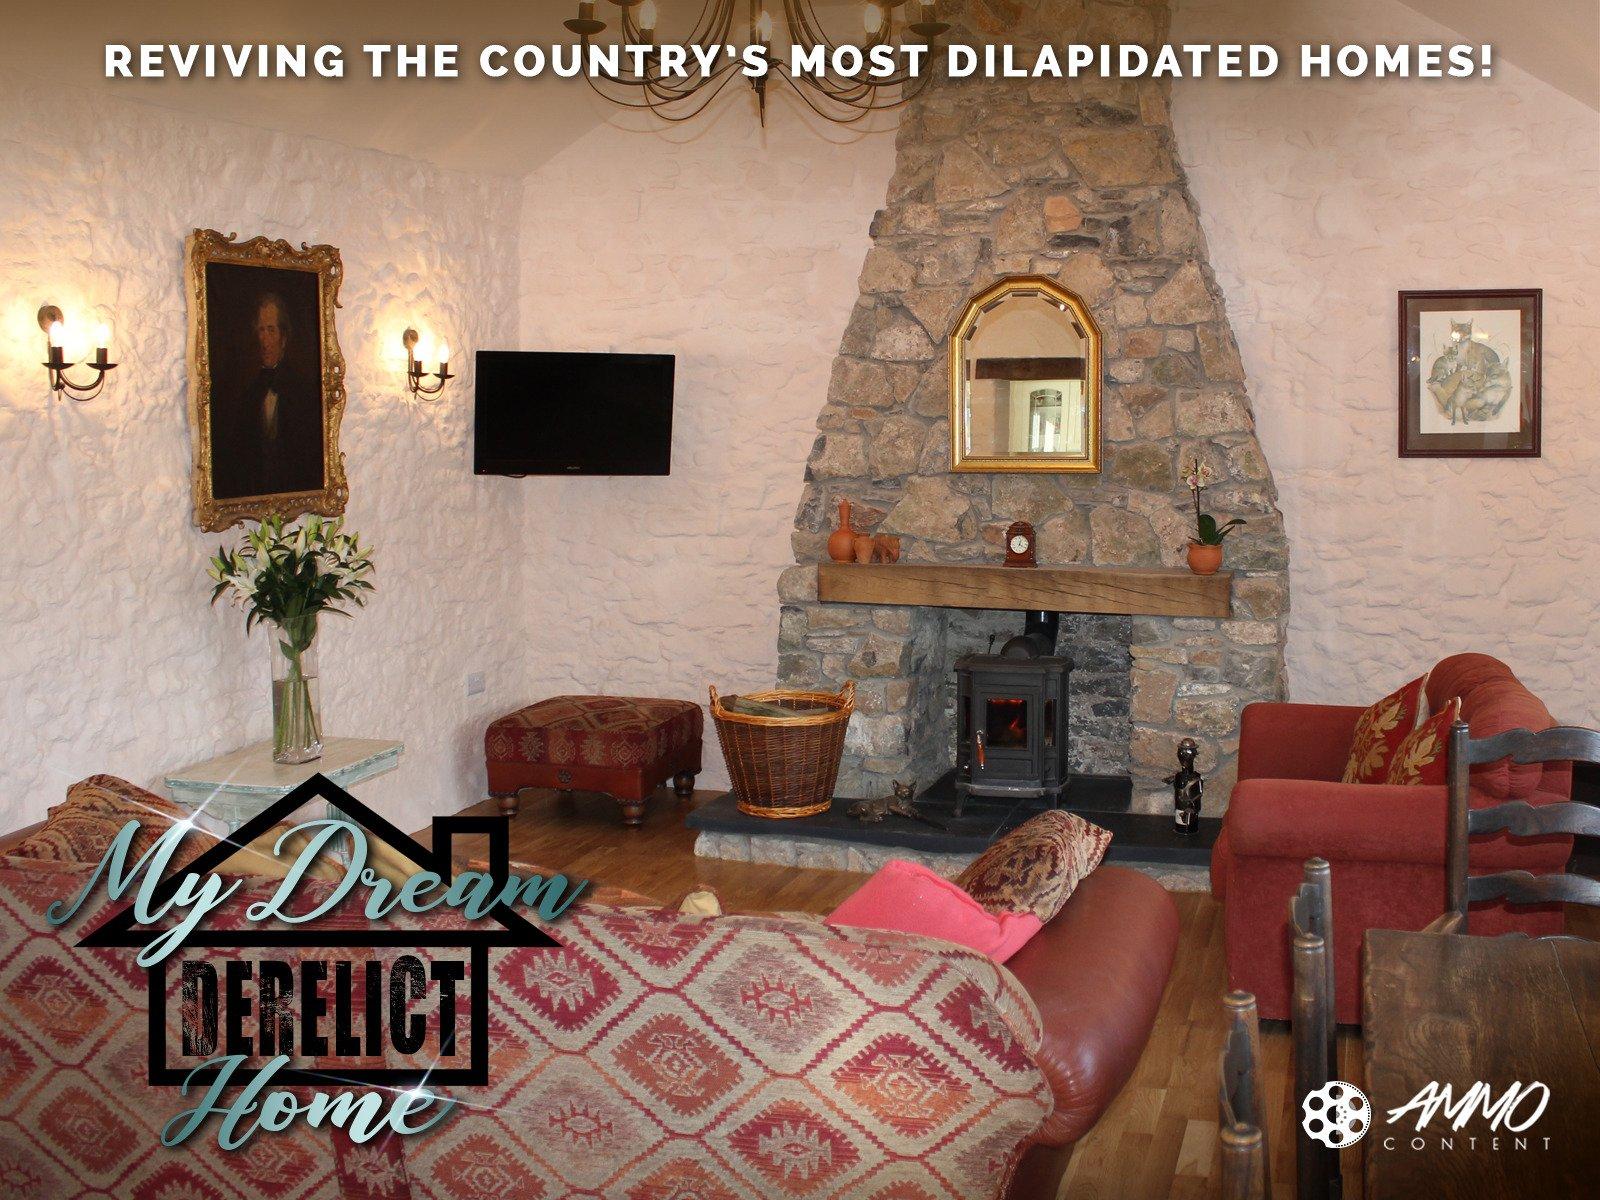 Watch My Dream Derelict Home Prime Video